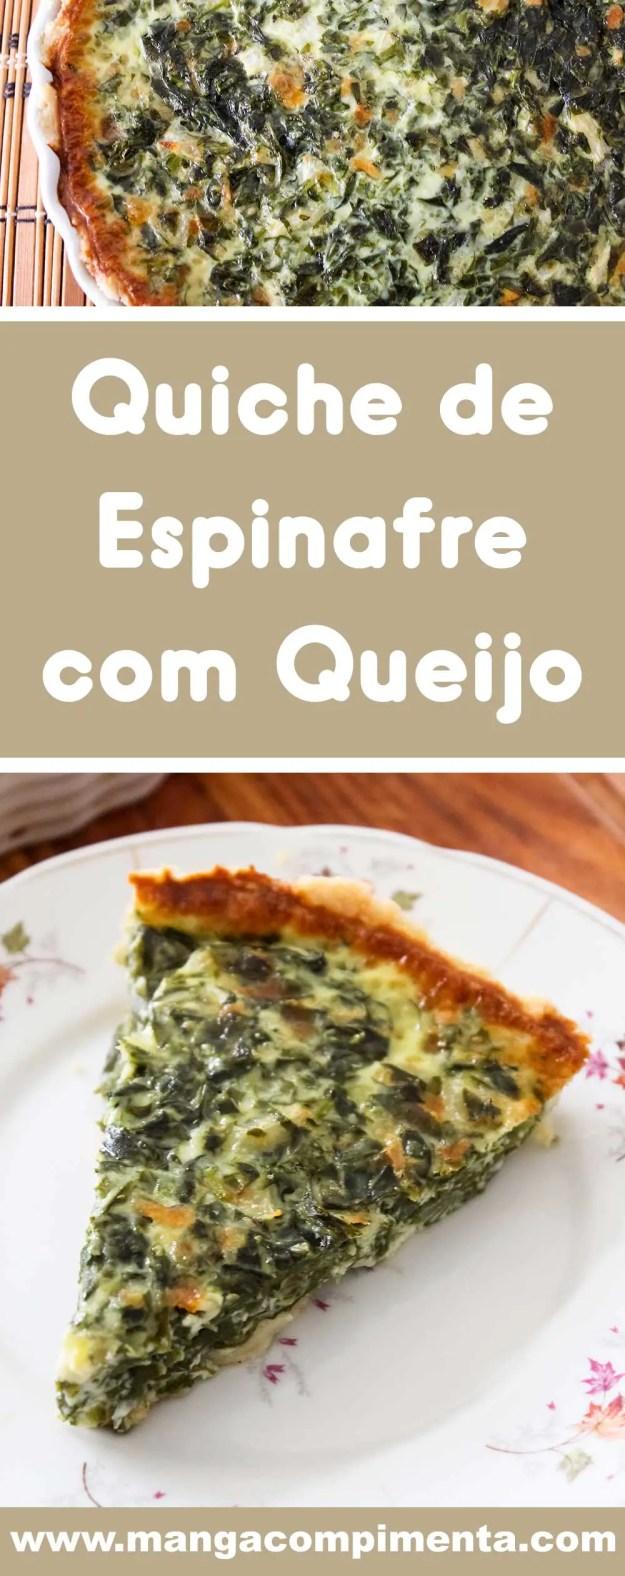 Receita de Quiche de Espinafre com Queijo - prepare um prato delicioso para as datas especiais.